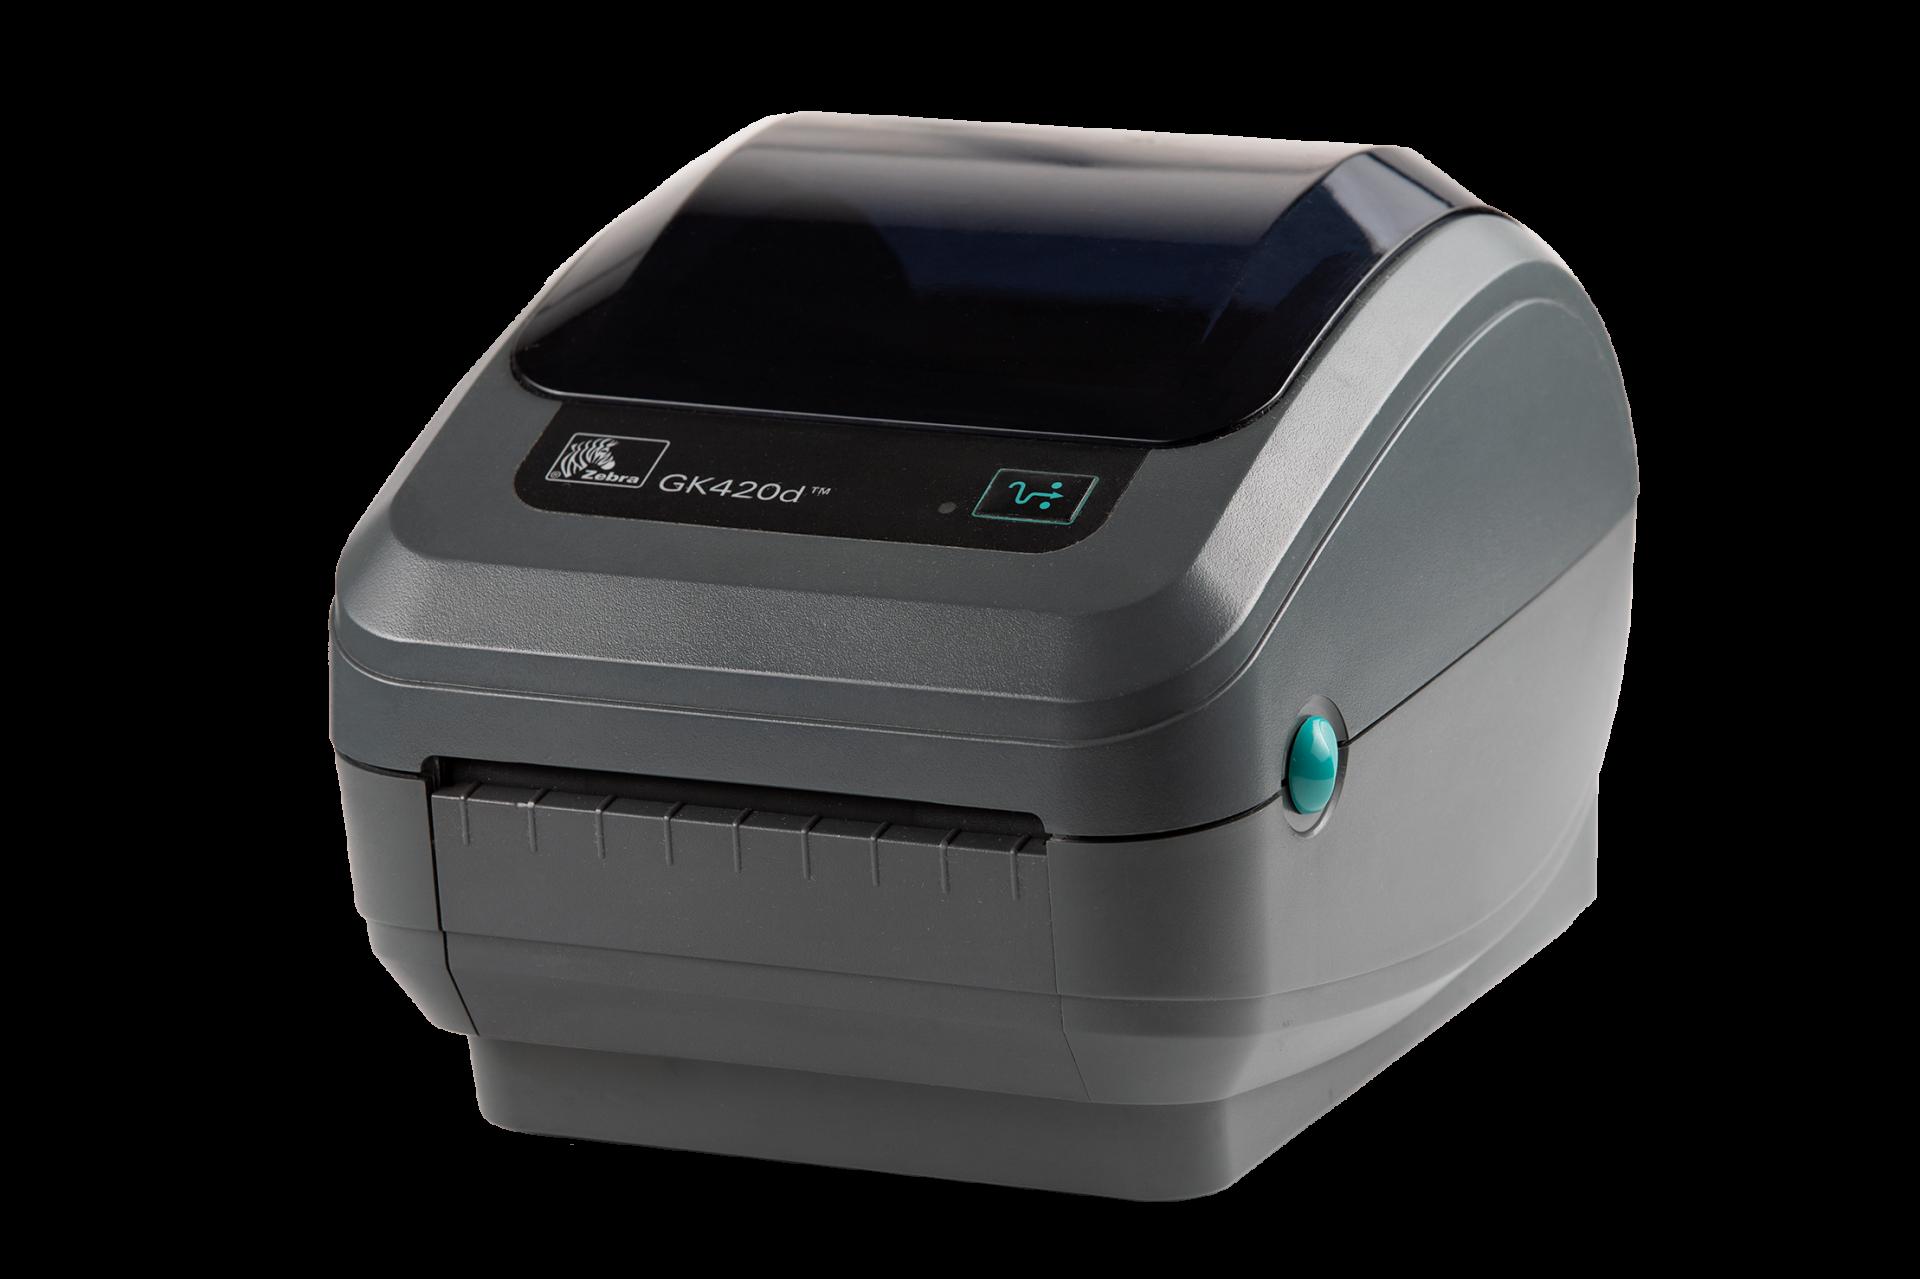 Zebra GK420d Ethernet Model (Grade A) | DN Printer ...